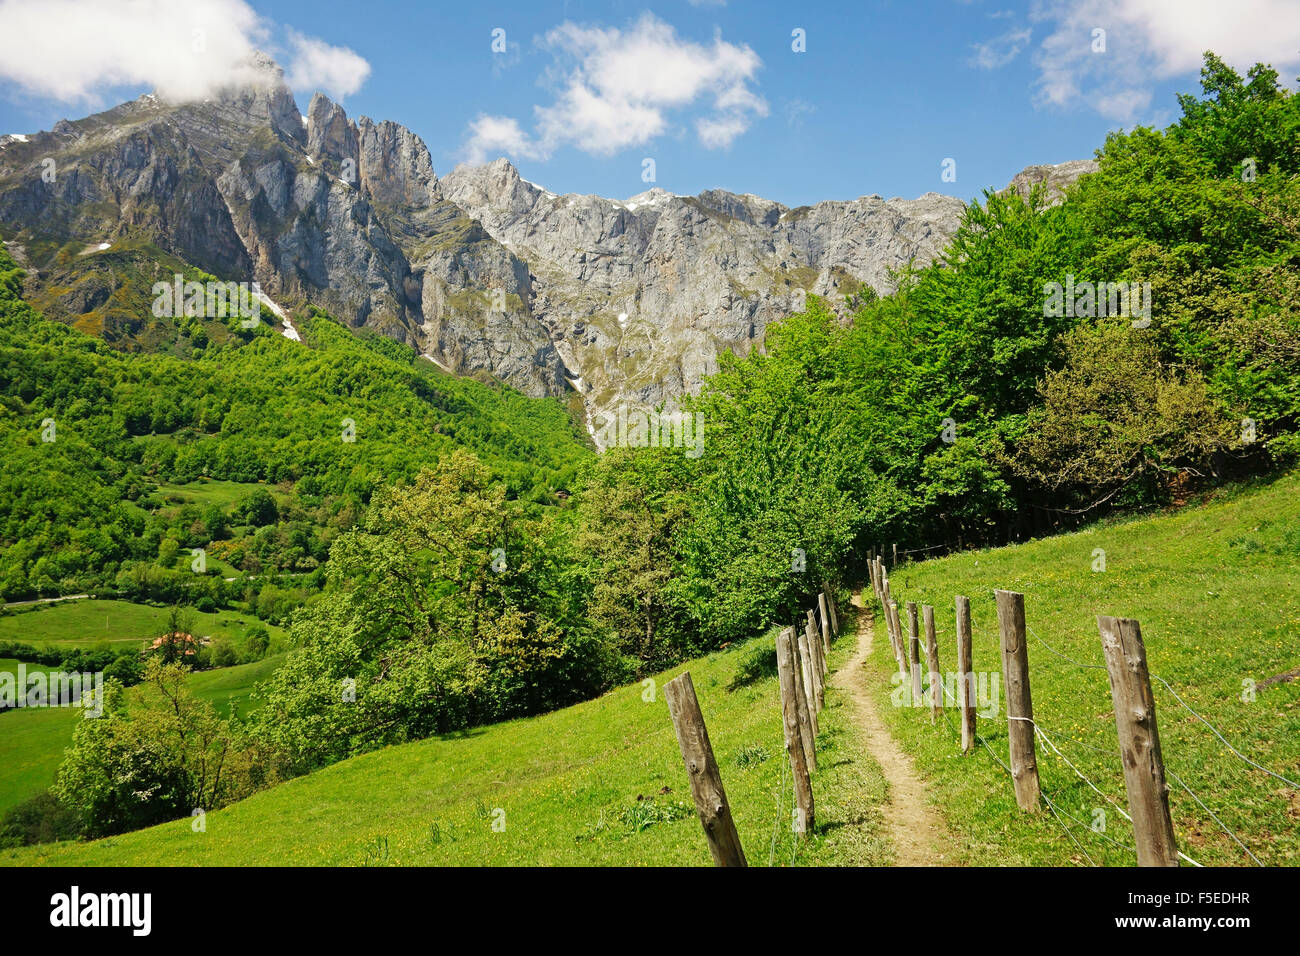 Fuente De, Picos de Europa, Parque Nacional de Los Picos de Europa, Asturien, Kantabrien, Spanien, Europa Stockbild